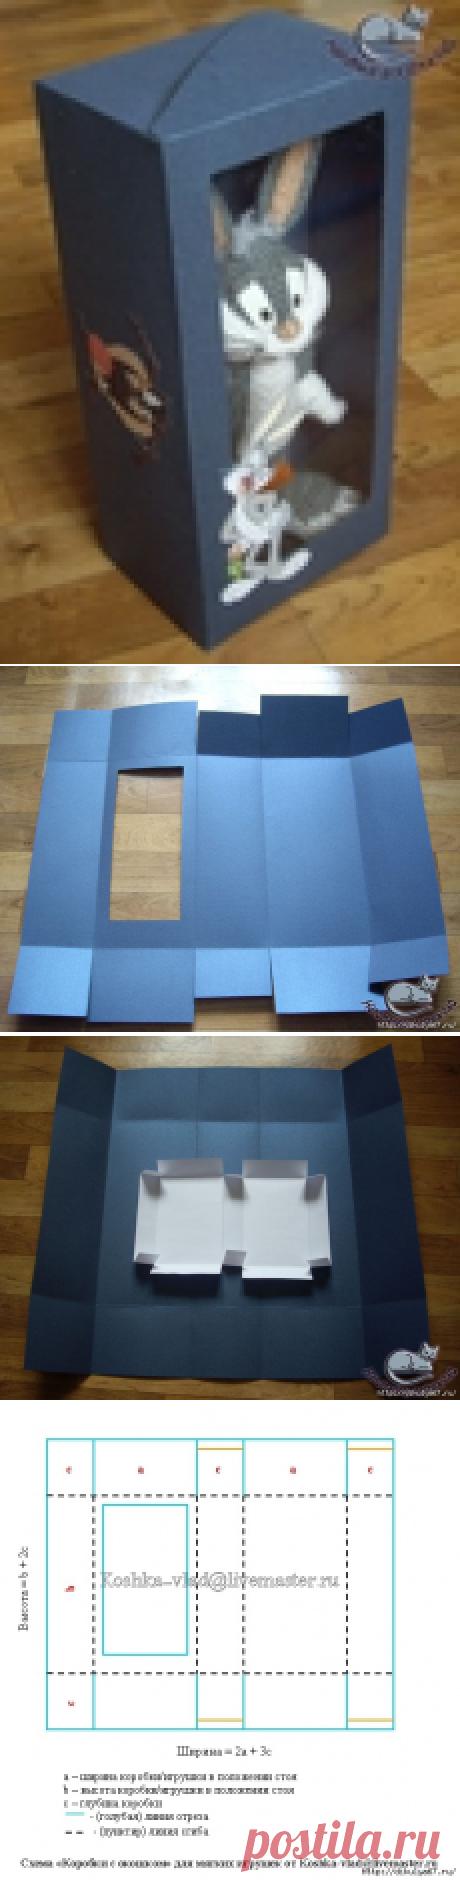 Box with a window. MK from Koshka-vlad (Ekaterina)